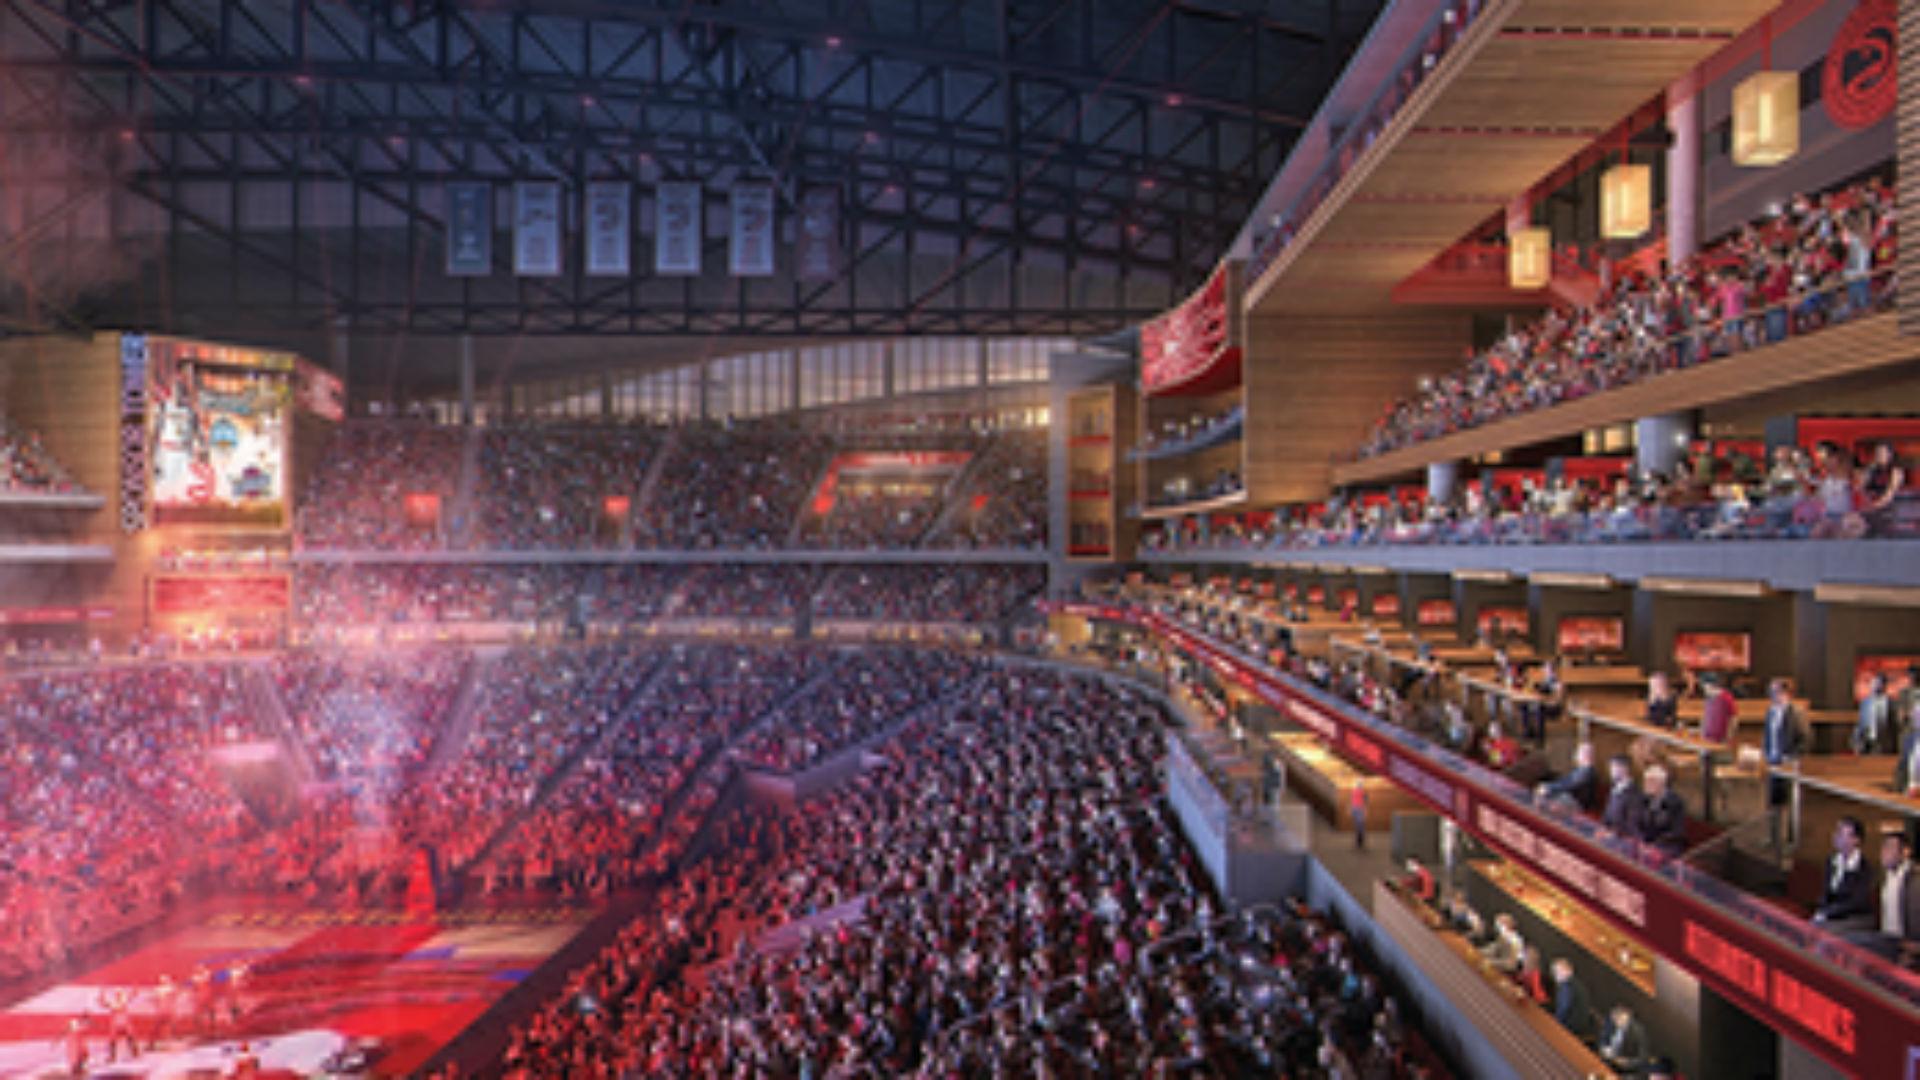 Suite wall ing down at Atlanta s Philips Arena as part of major renovations NBA